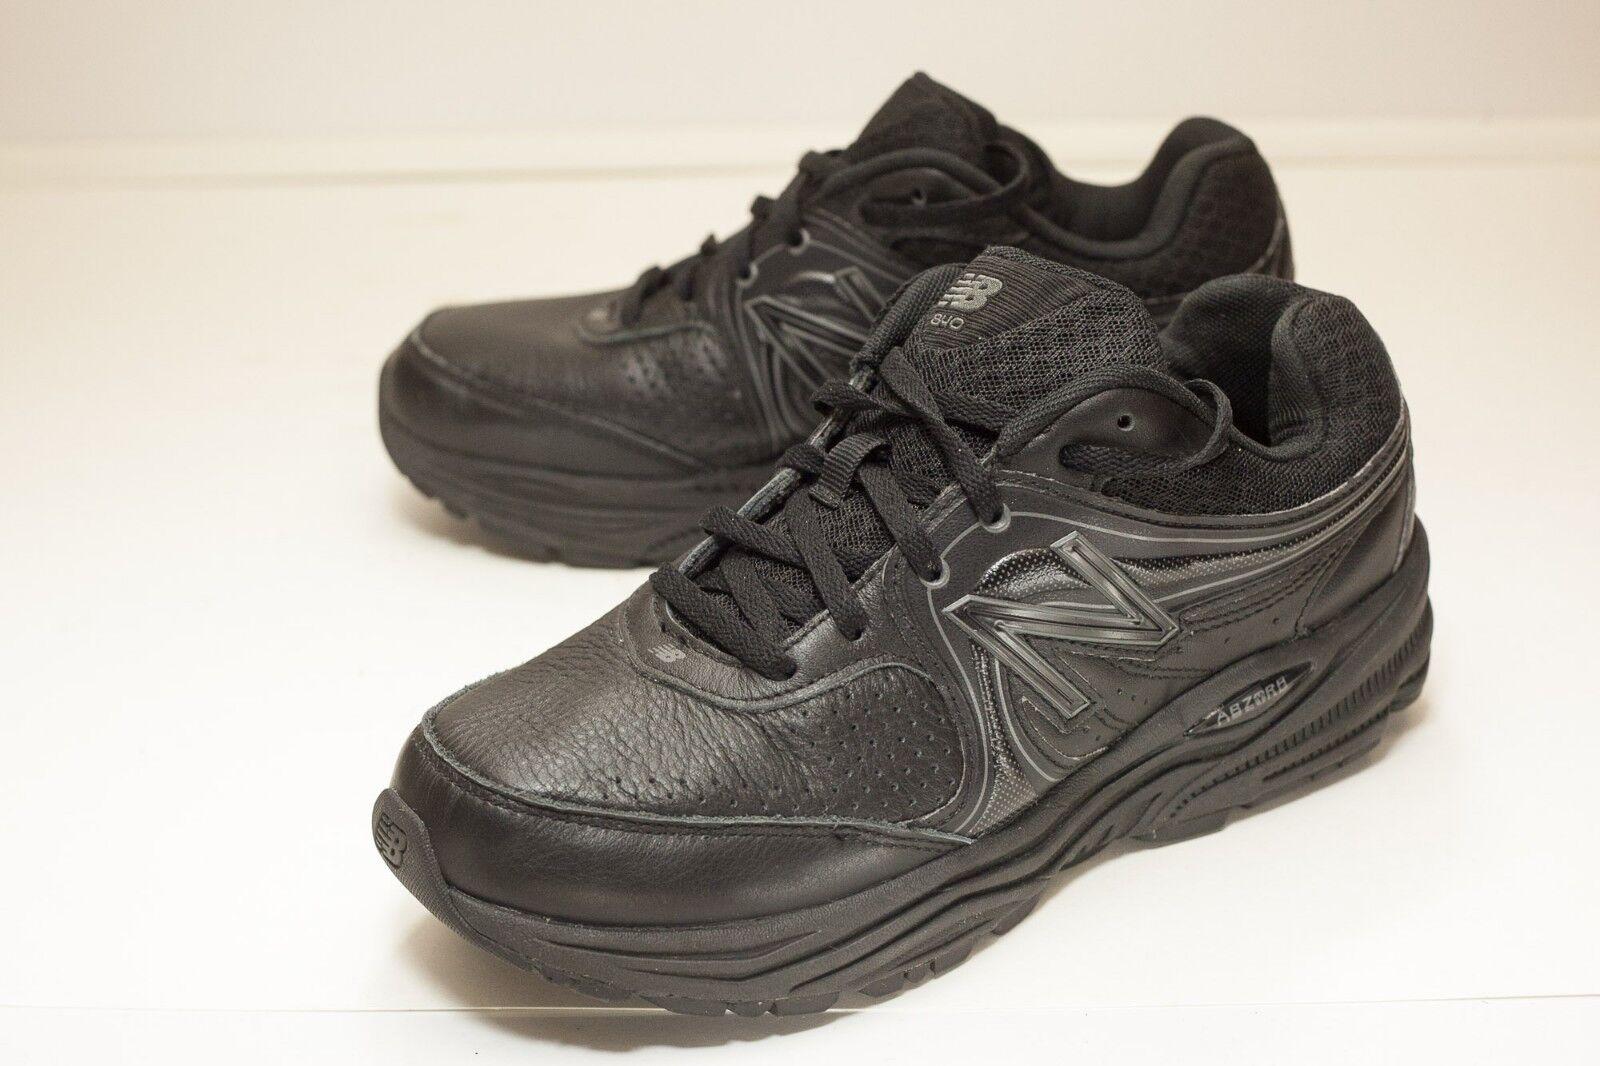 New Balance 840 US 7 Black Walking shoes Women's